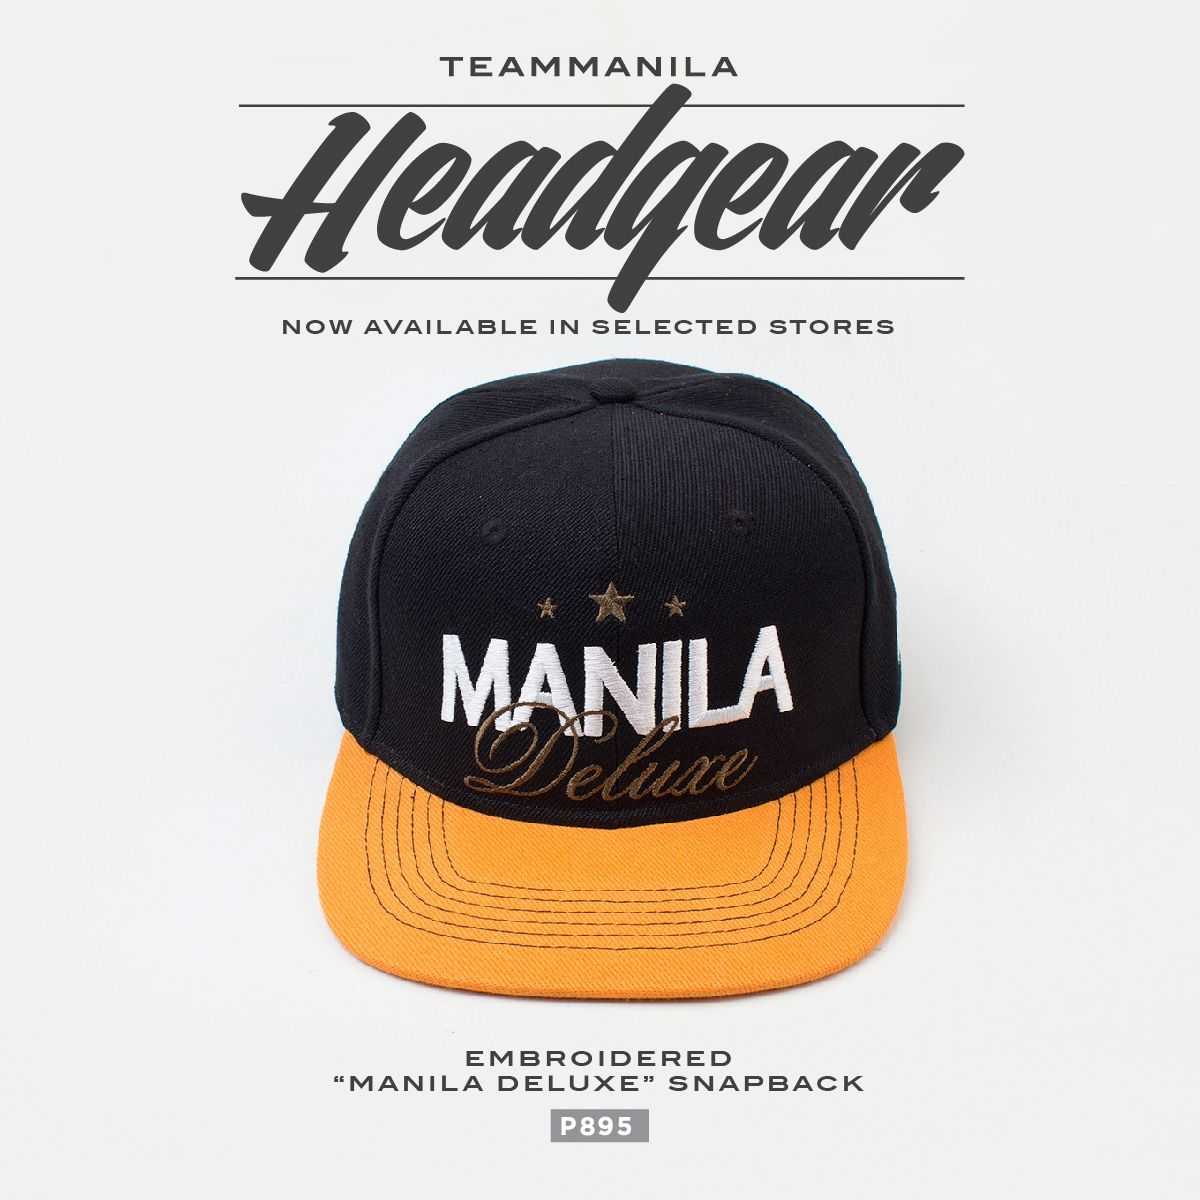 TeamManila Embroidered